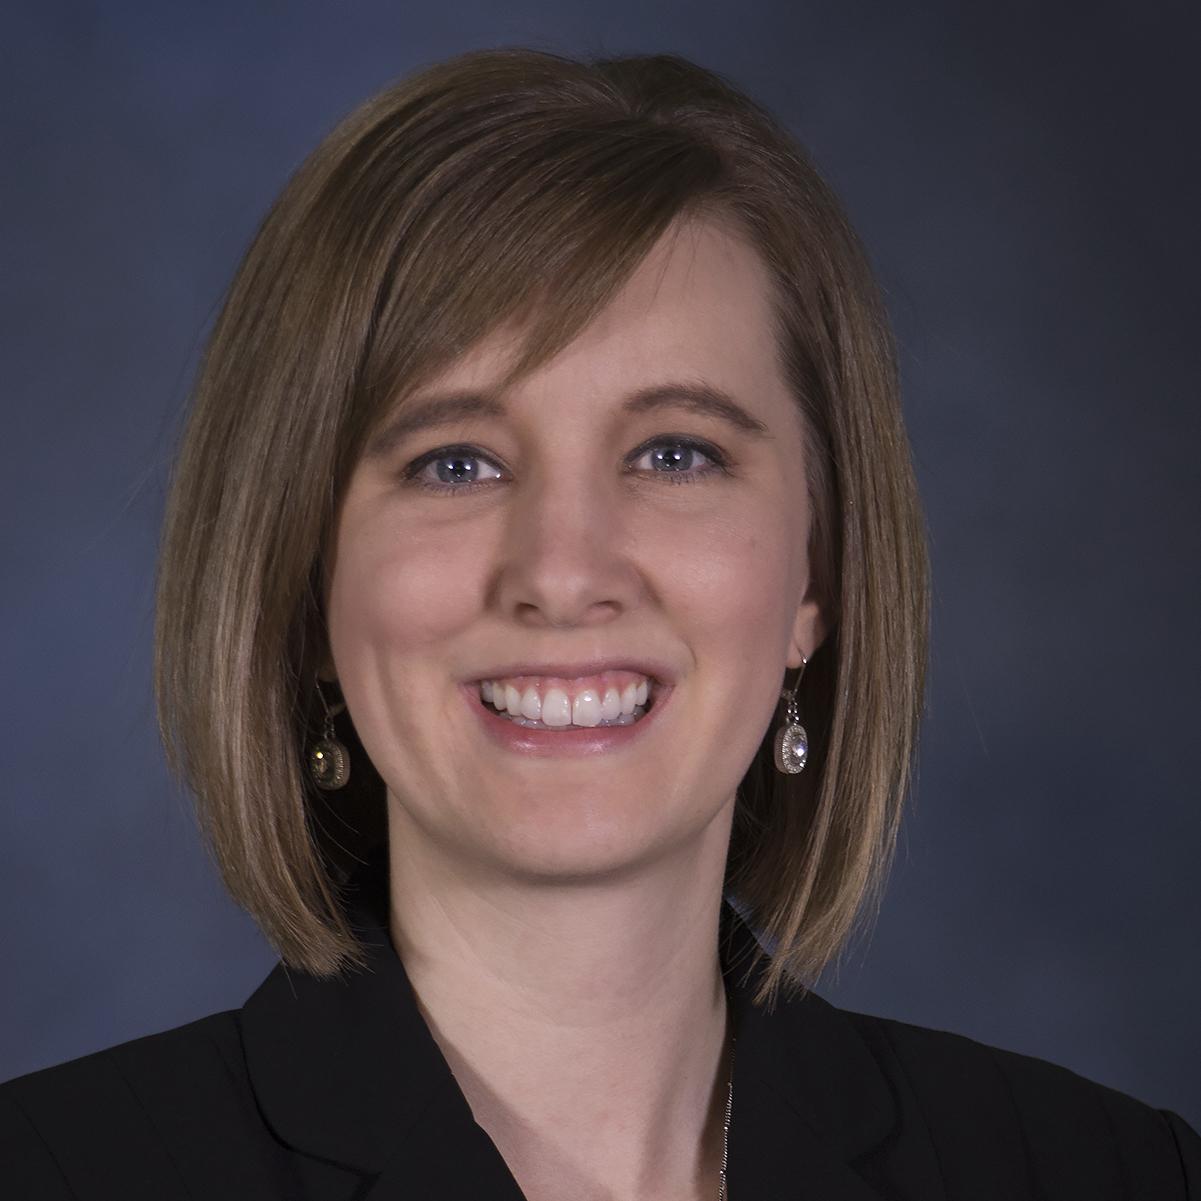 Jenna Korsmeyer